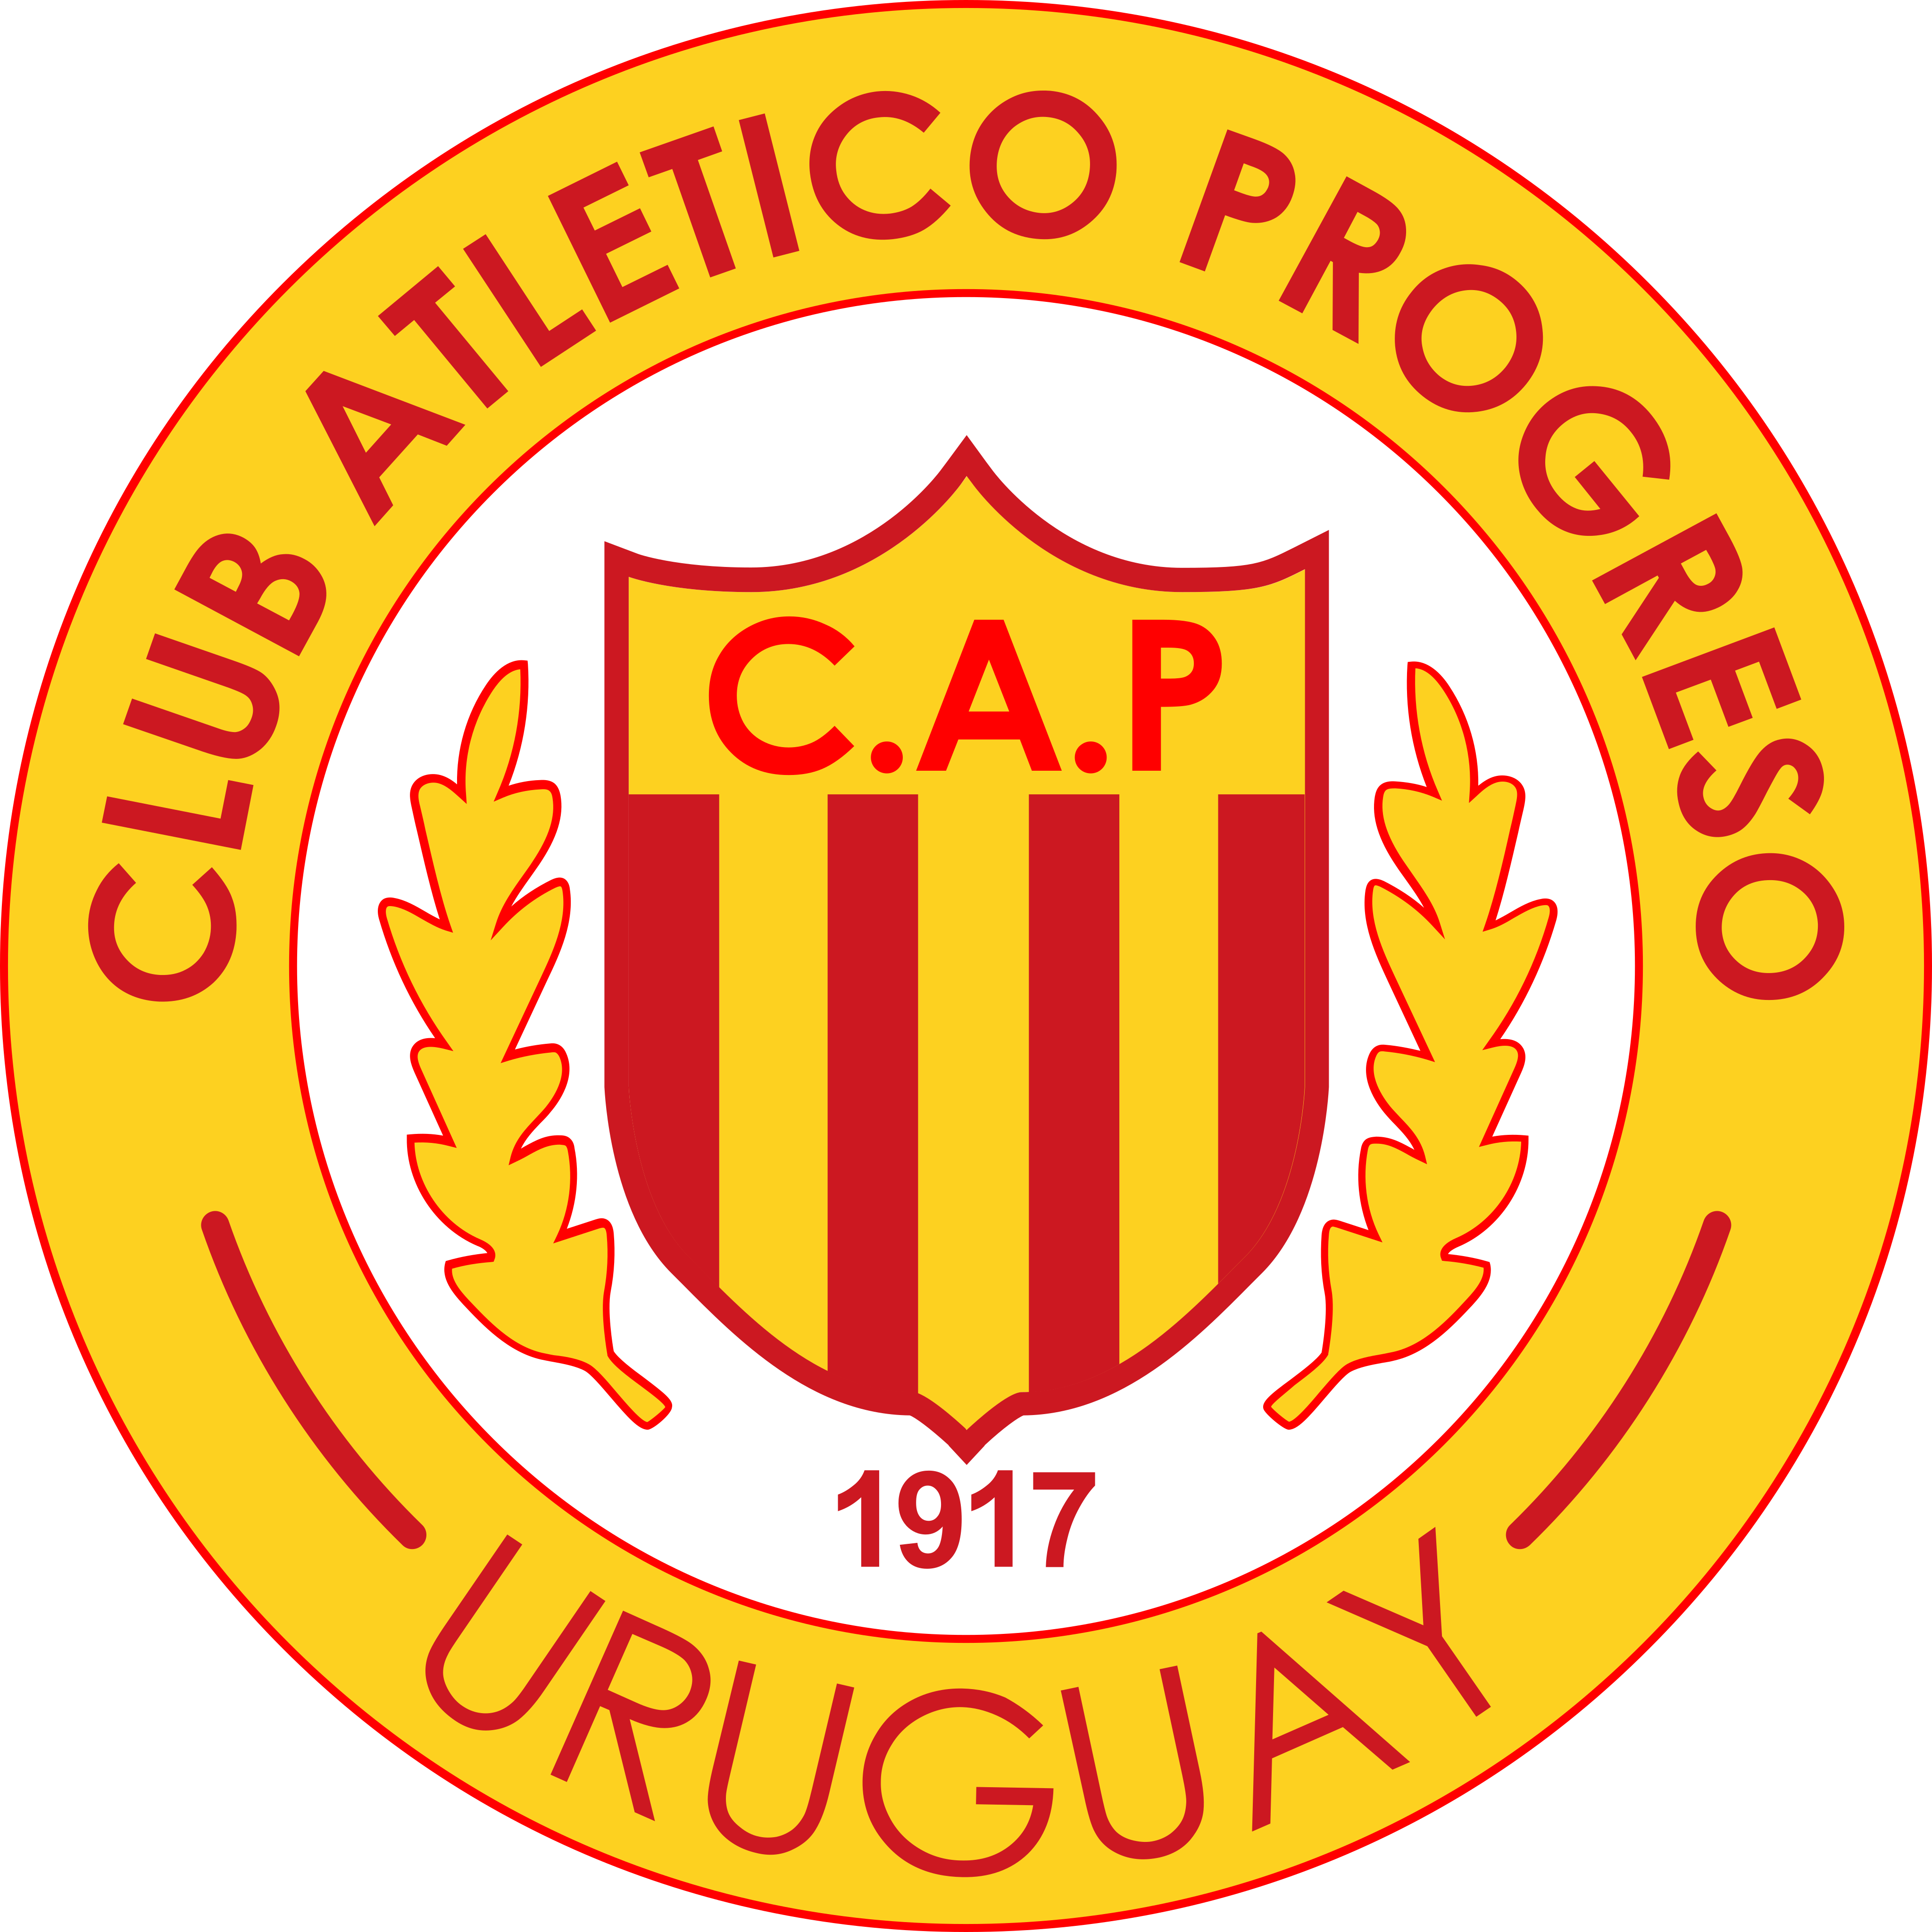 cd progreso logo escudo - Club Atlético Progreso Logo - Escudo